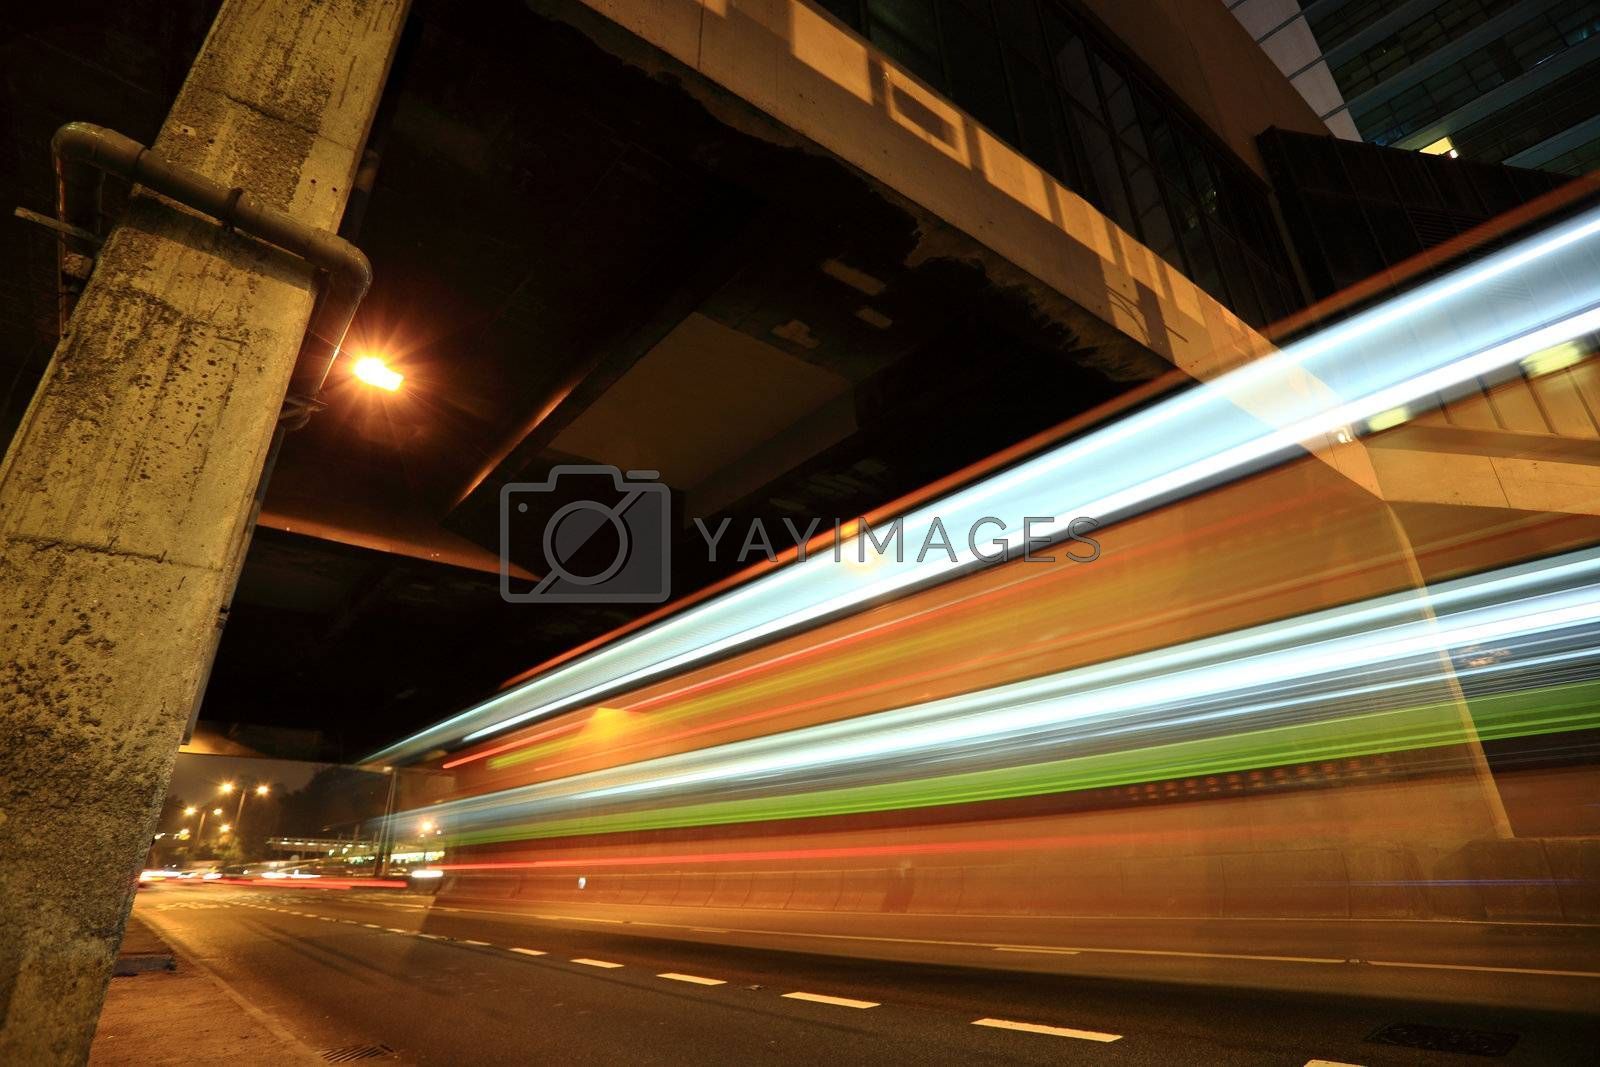 Highway in Hong Kong by leungchopan